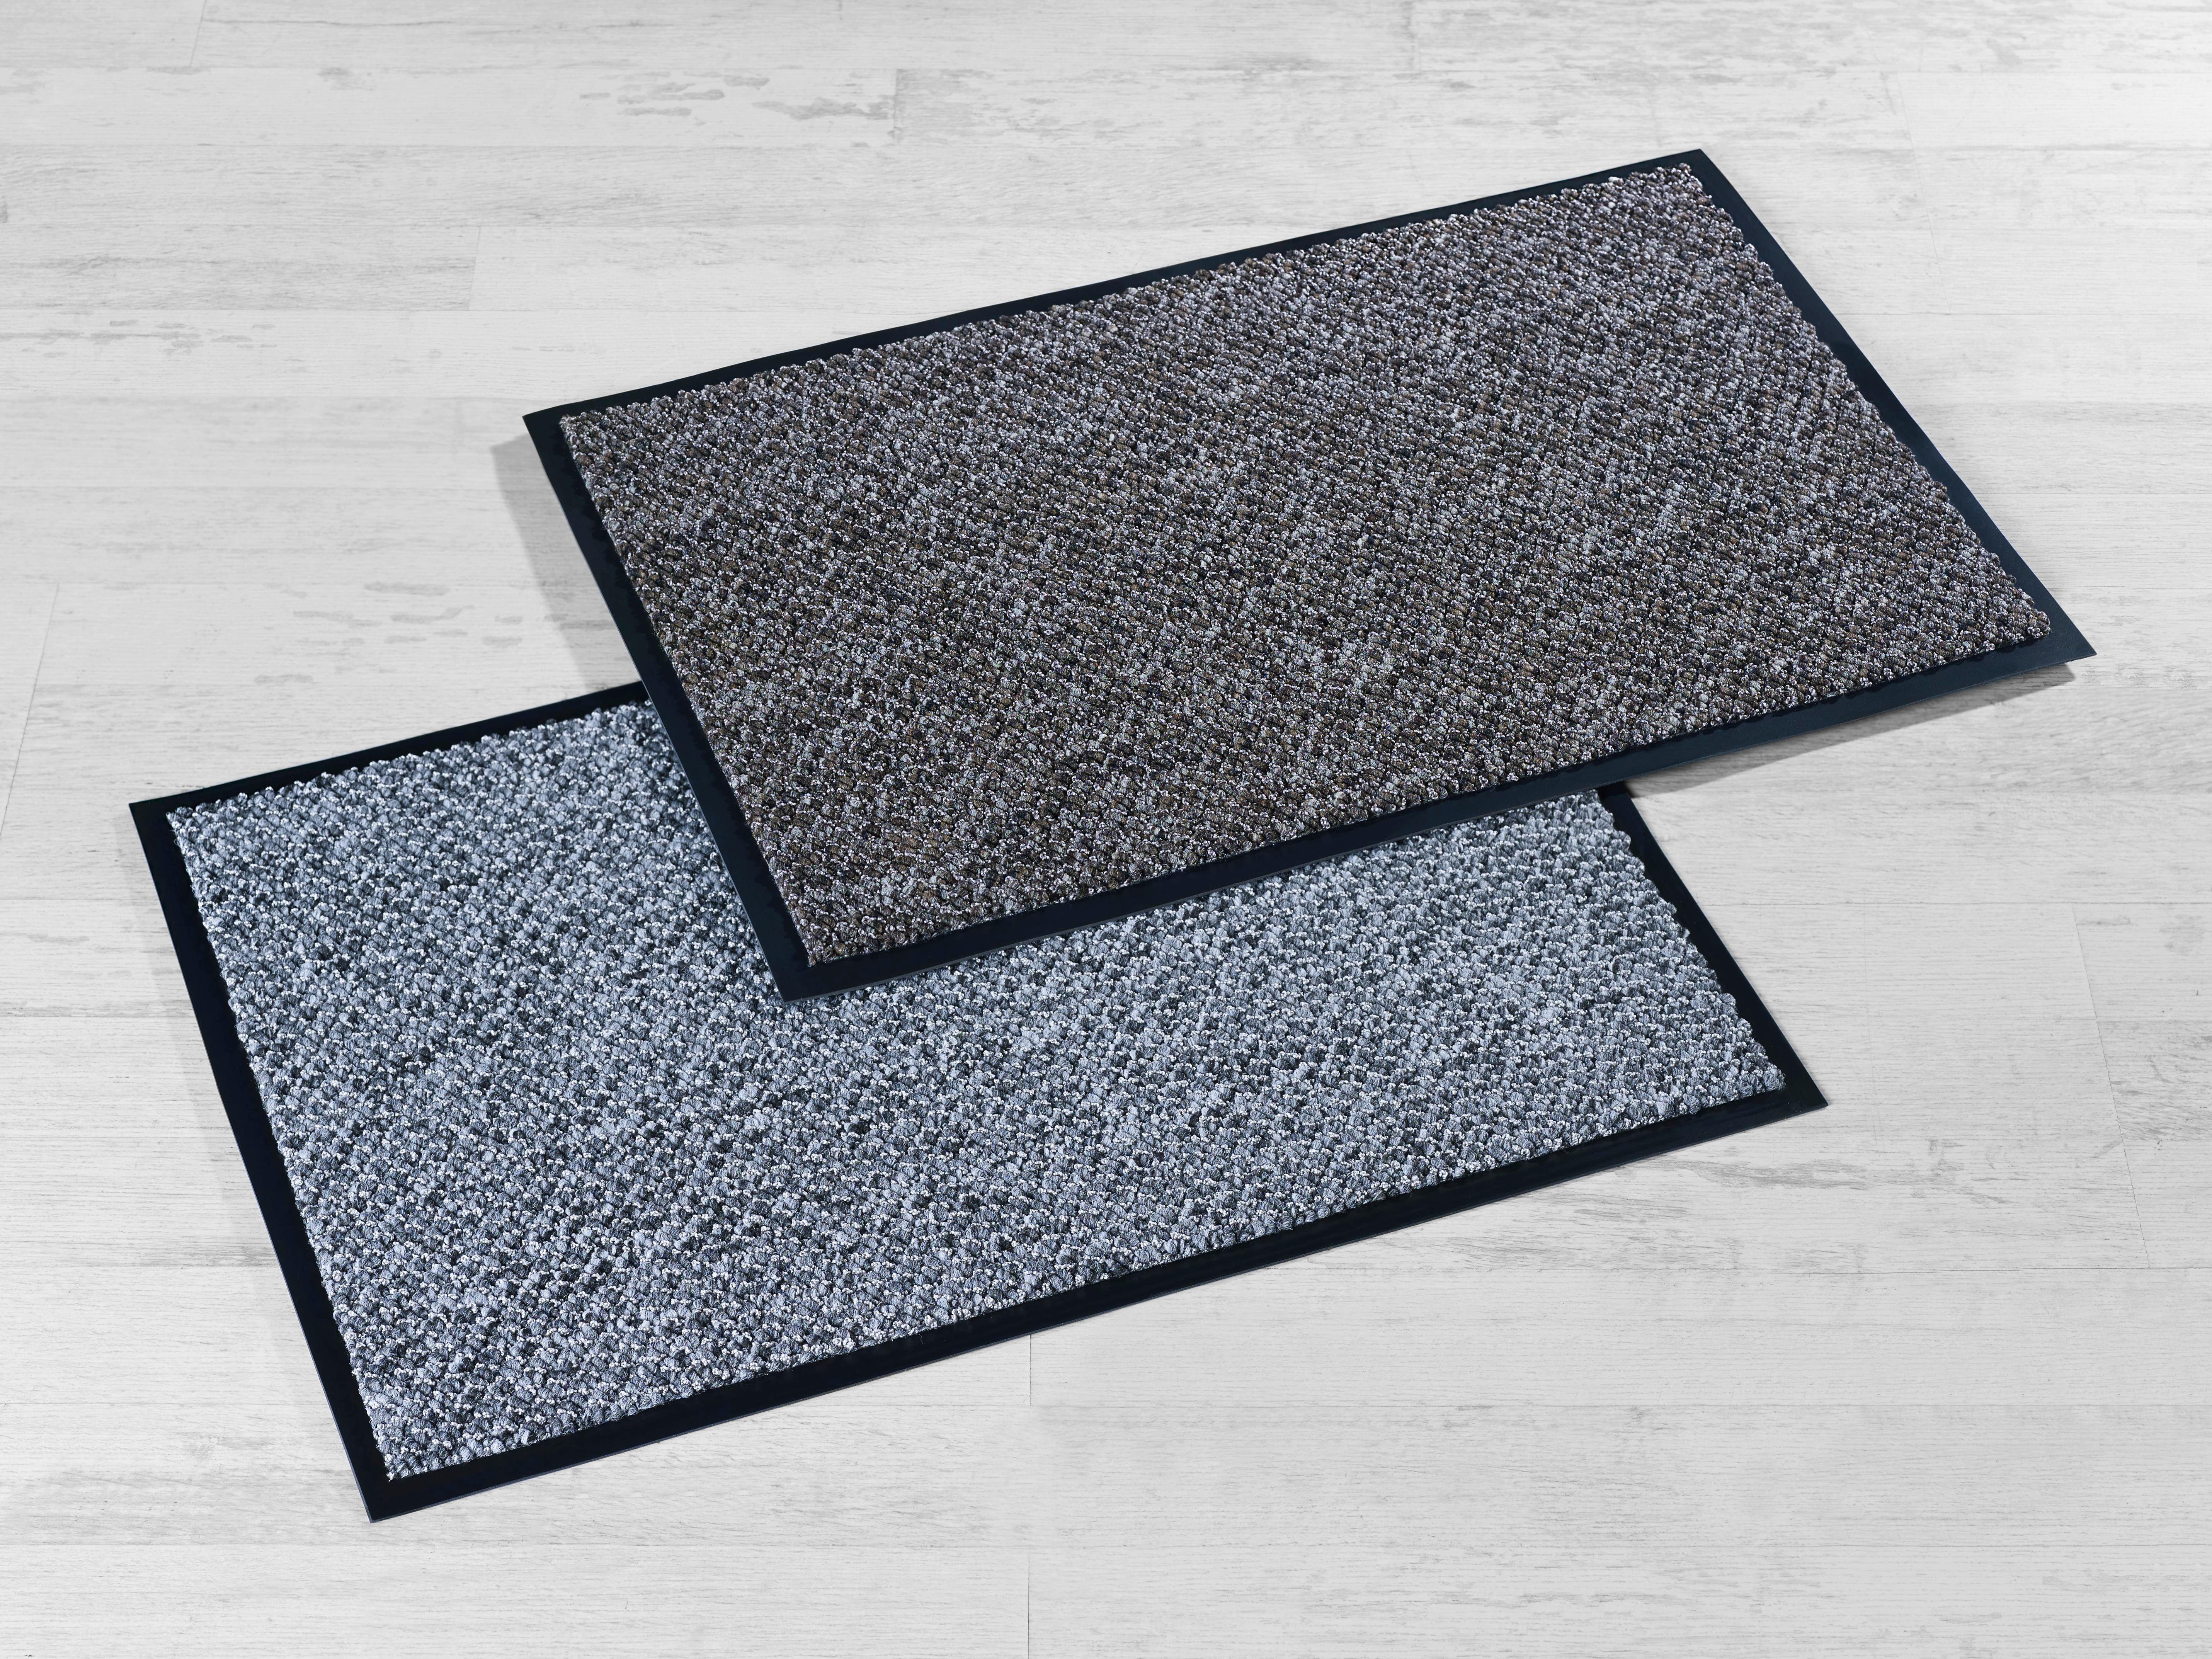 Fußmatte Nora in Grau, ca. 40x60cm - Grau, MODERN, Kunststoff (40/60cm) - MÖMAX modern living